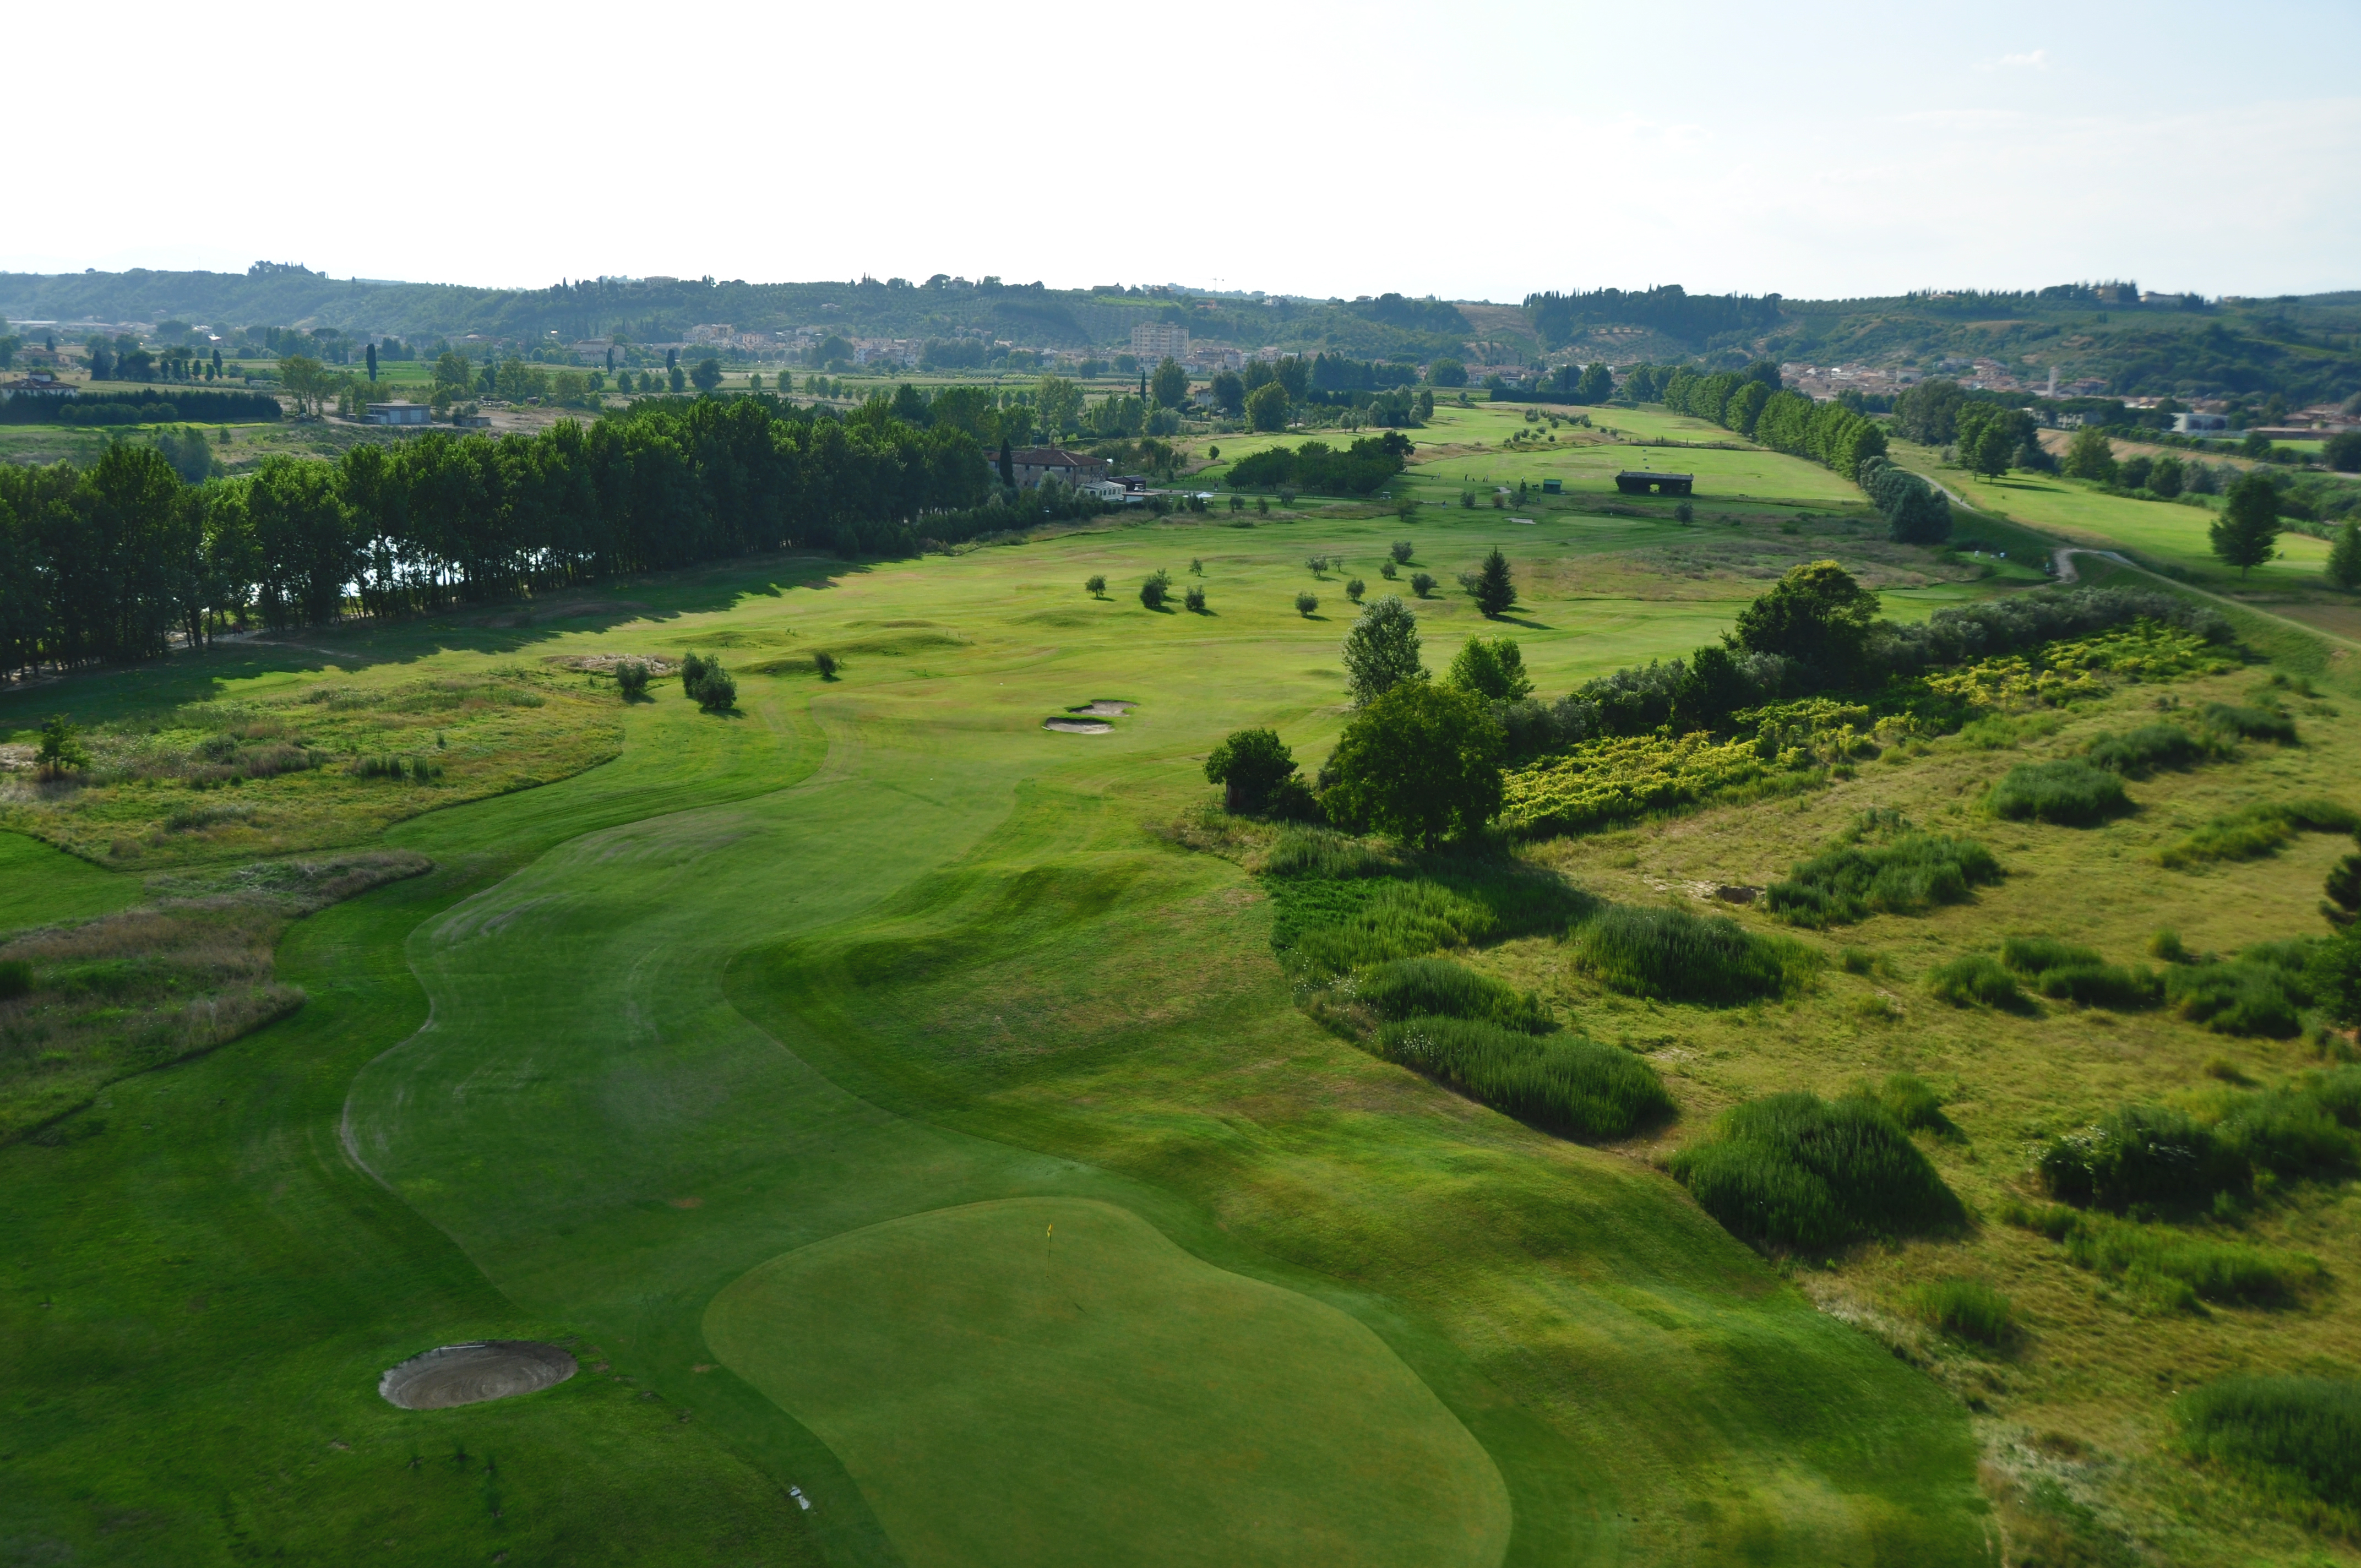 Montelupo Golf Club